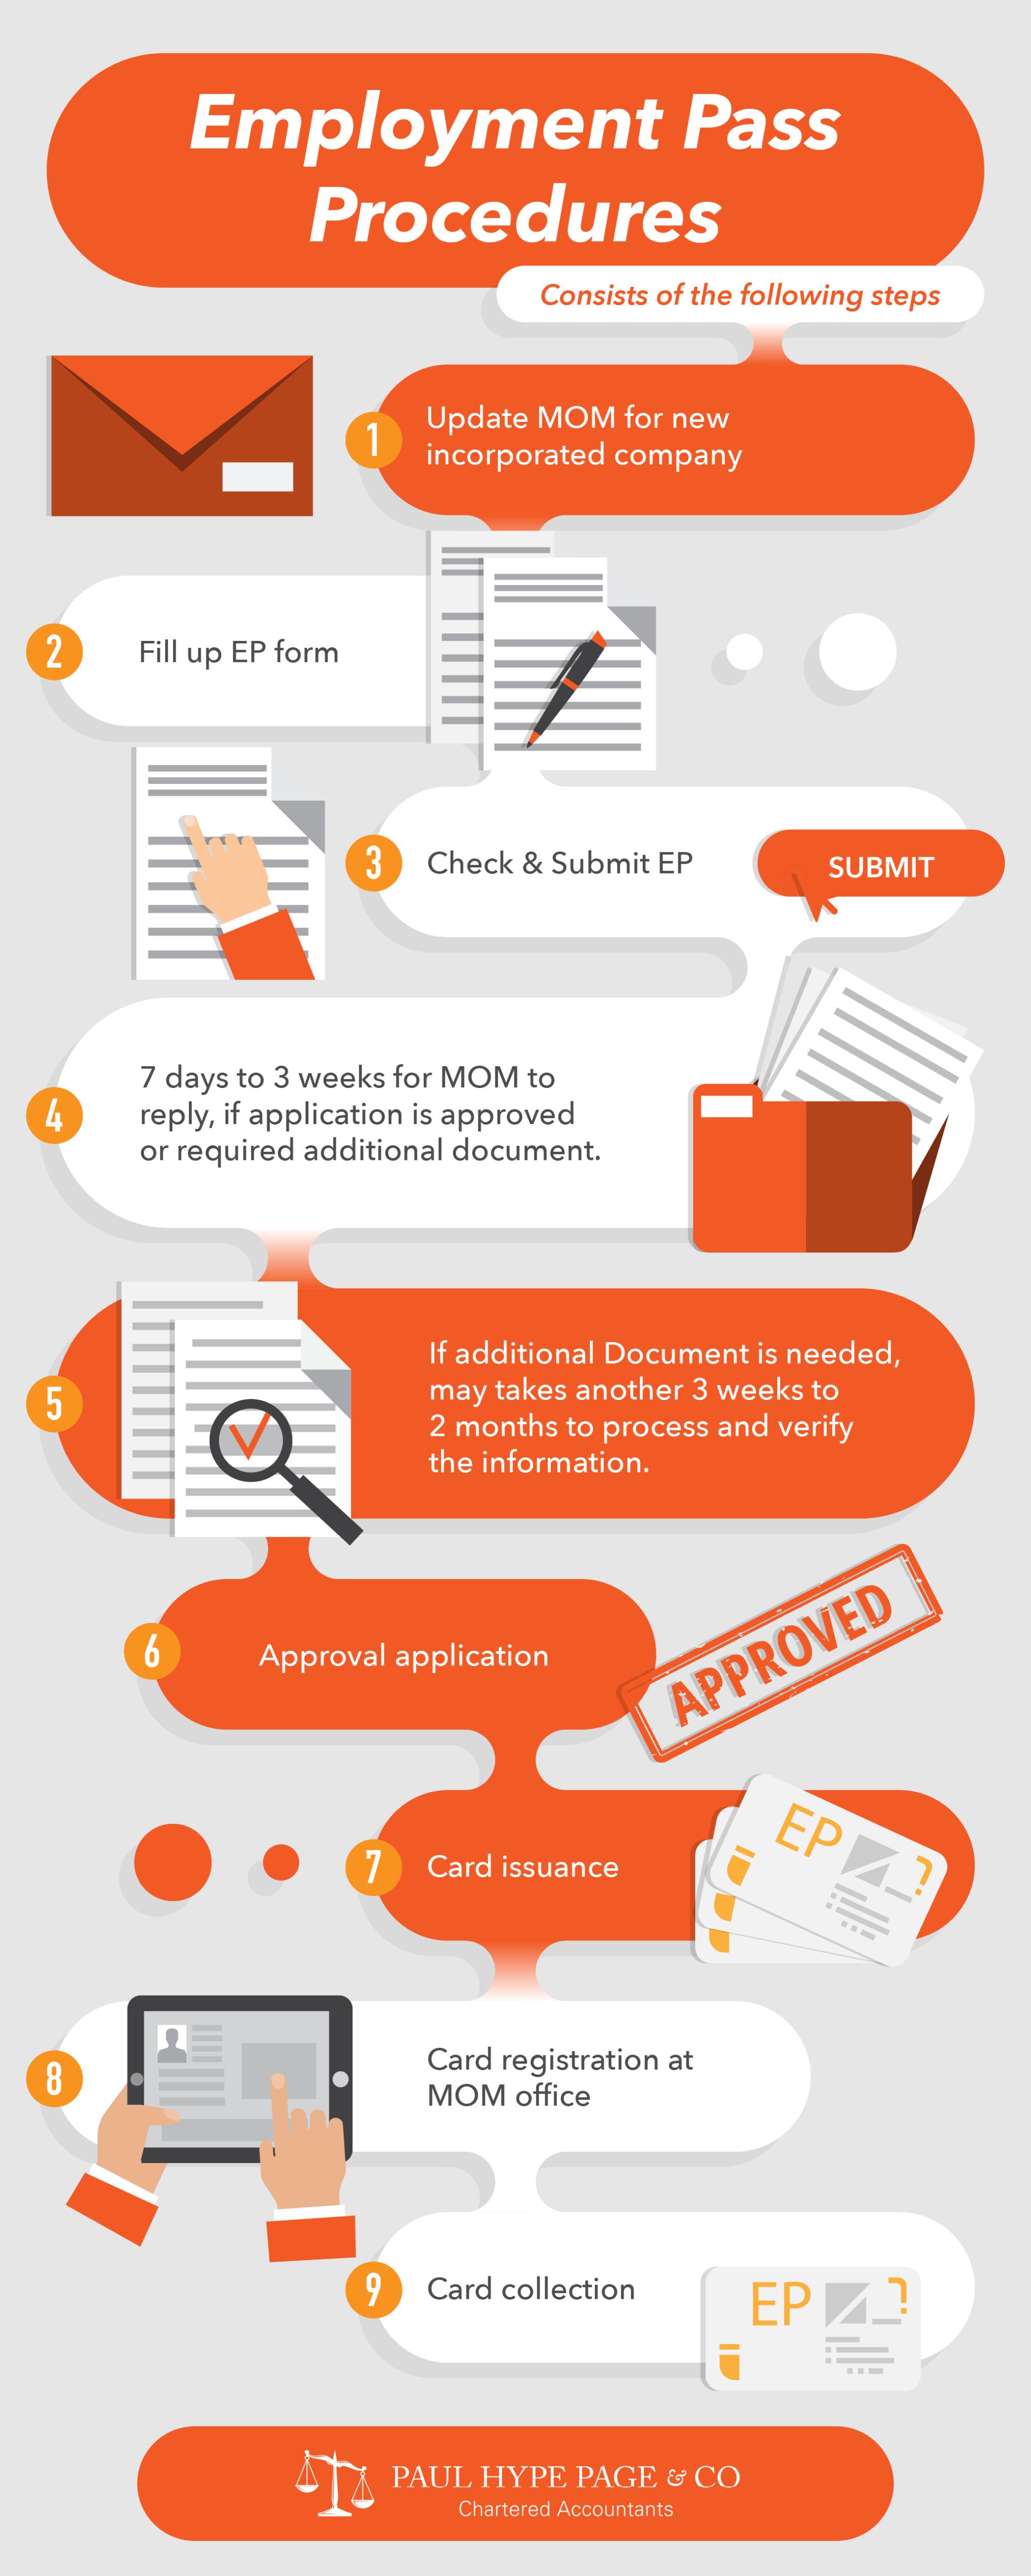 Employment Pass Procedures in Singapore